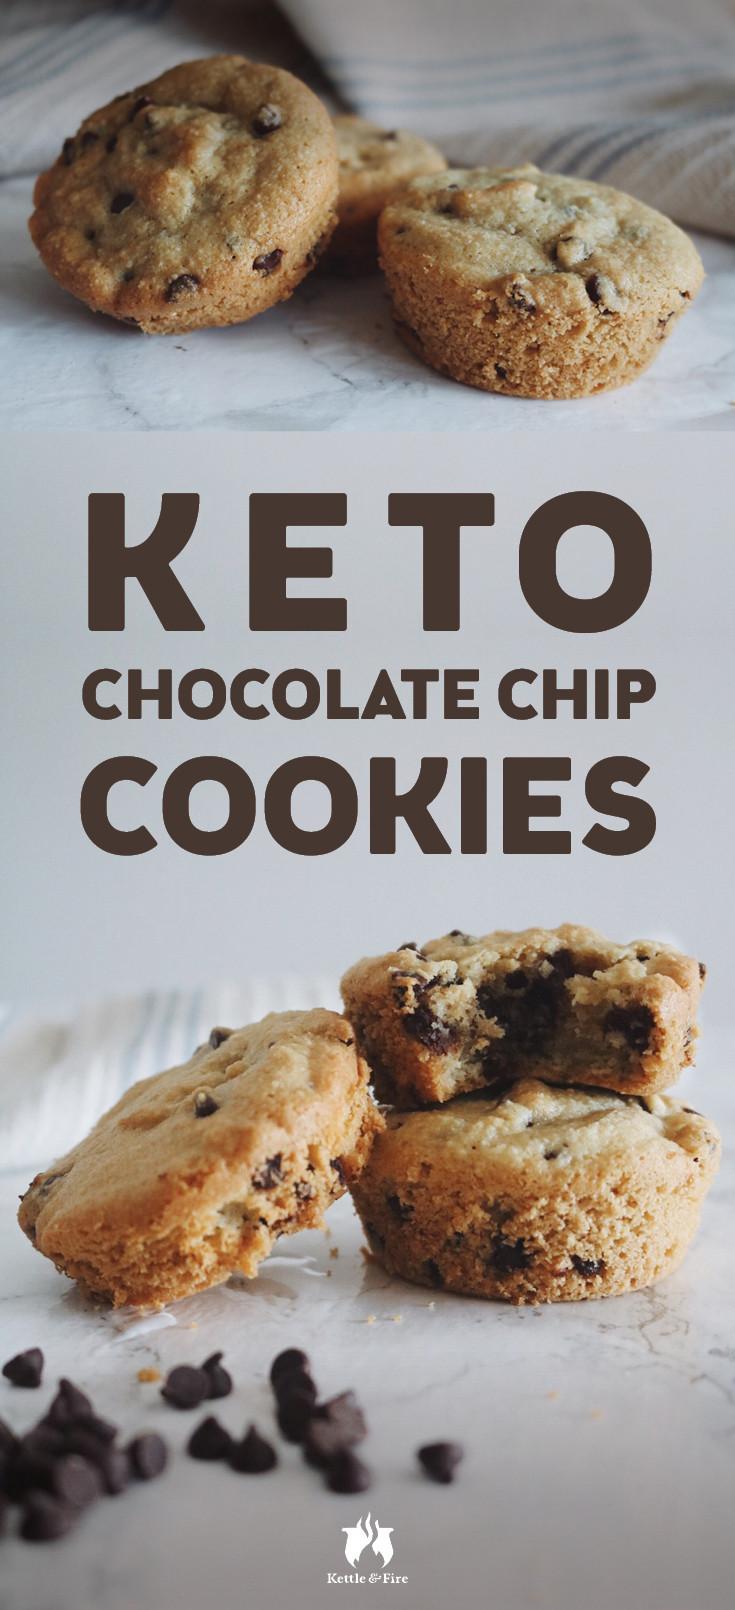 Keto Chocolate Cookies  Keto Chocolate Chip Cookies